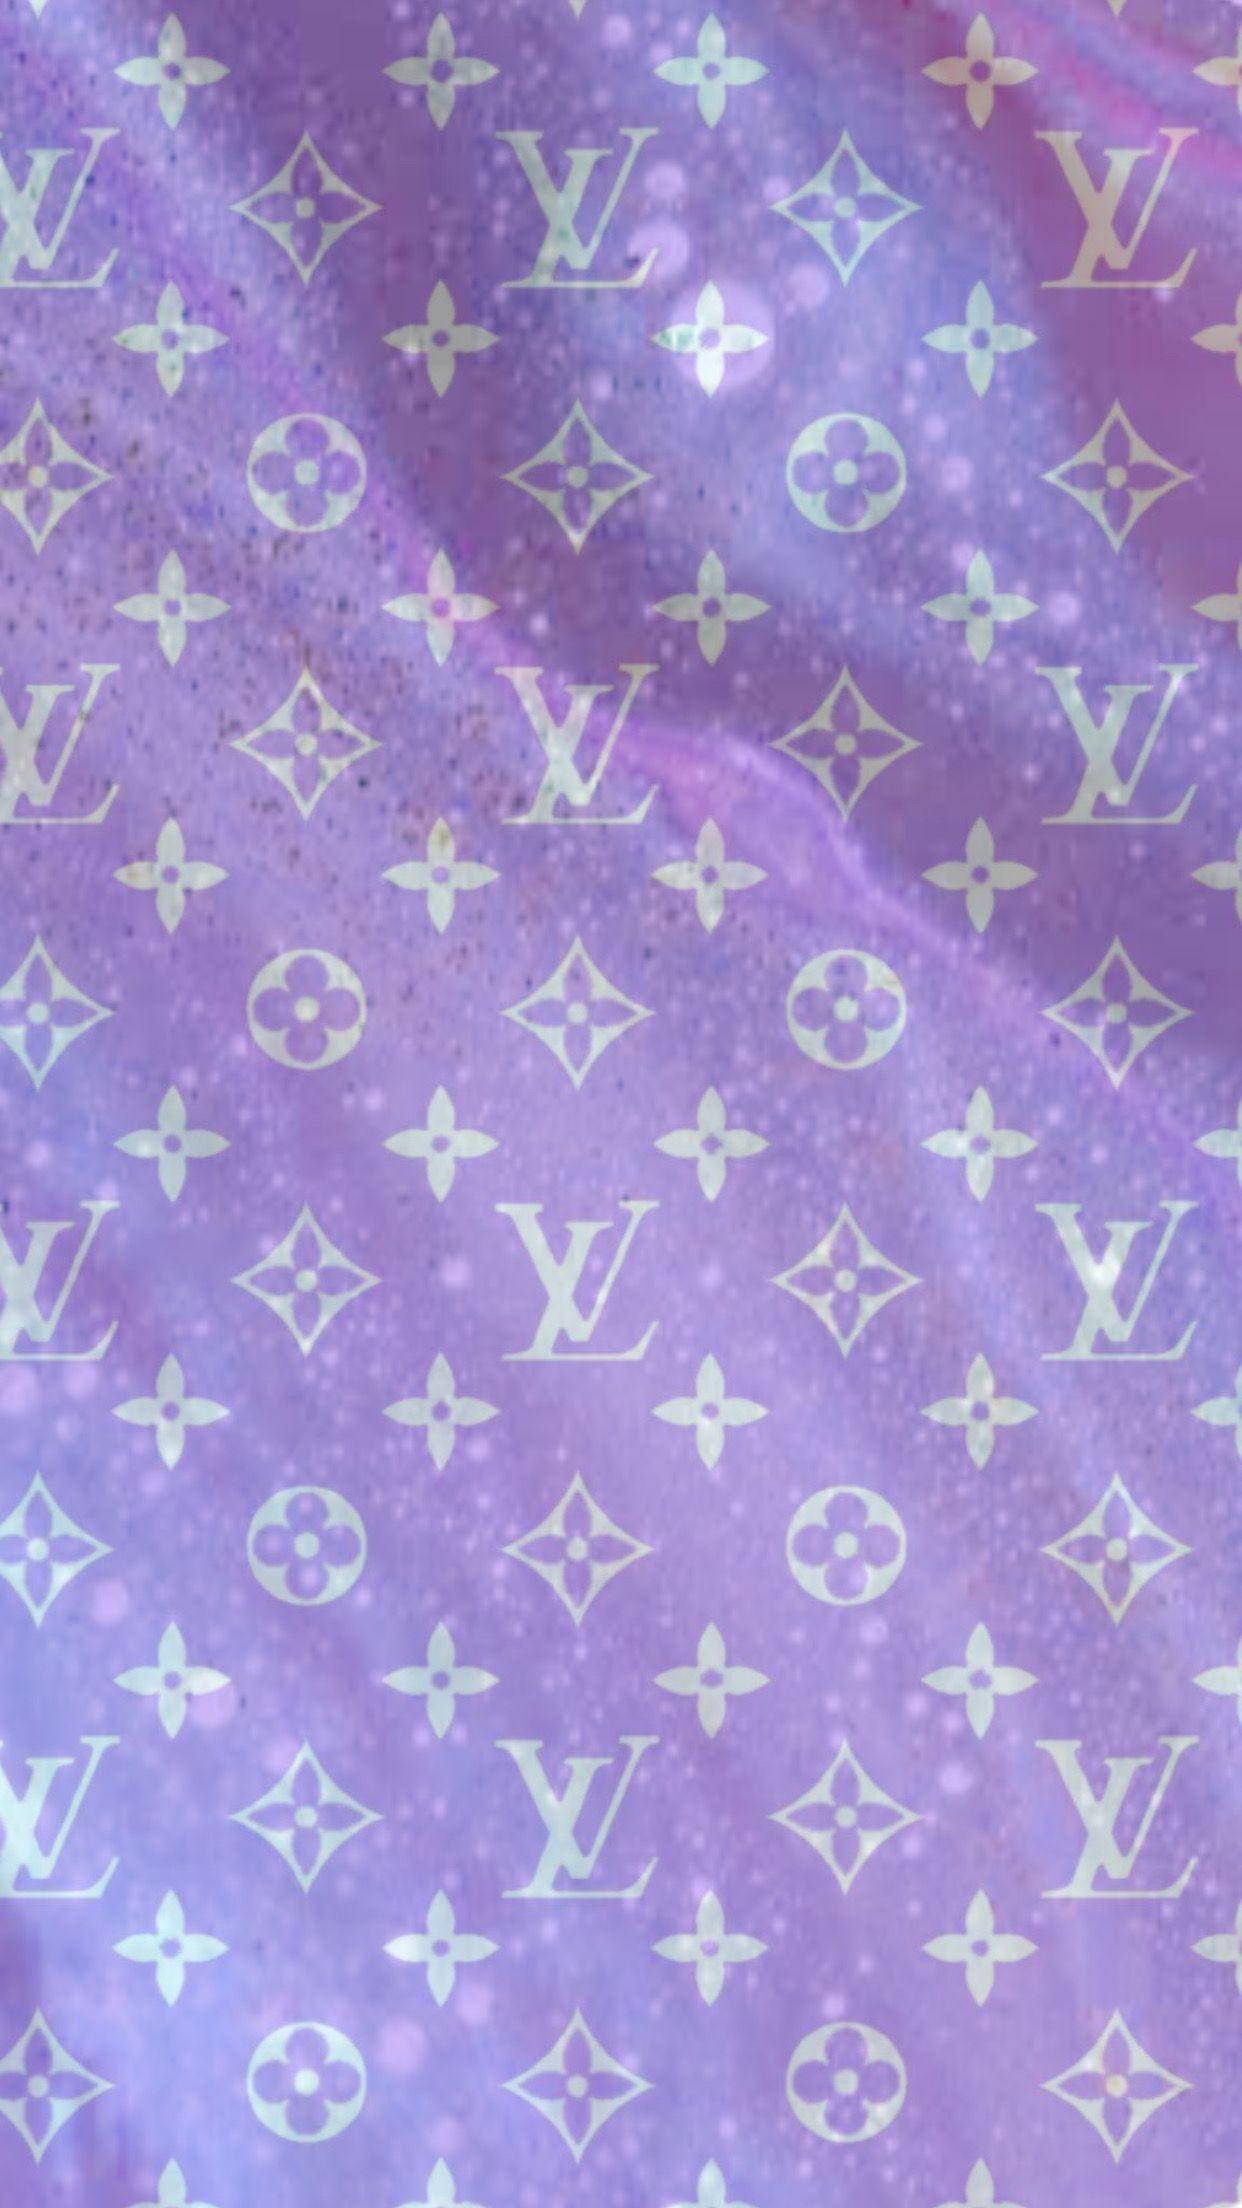 Marble Louis Vuitton Wallpaper Purple Glitter Vsco Lv Inspiration Lv Wallpape Purple Glitter Wallpaper Louis Vuitton Iphone Wallpaper Purple Wallpaper Iphone